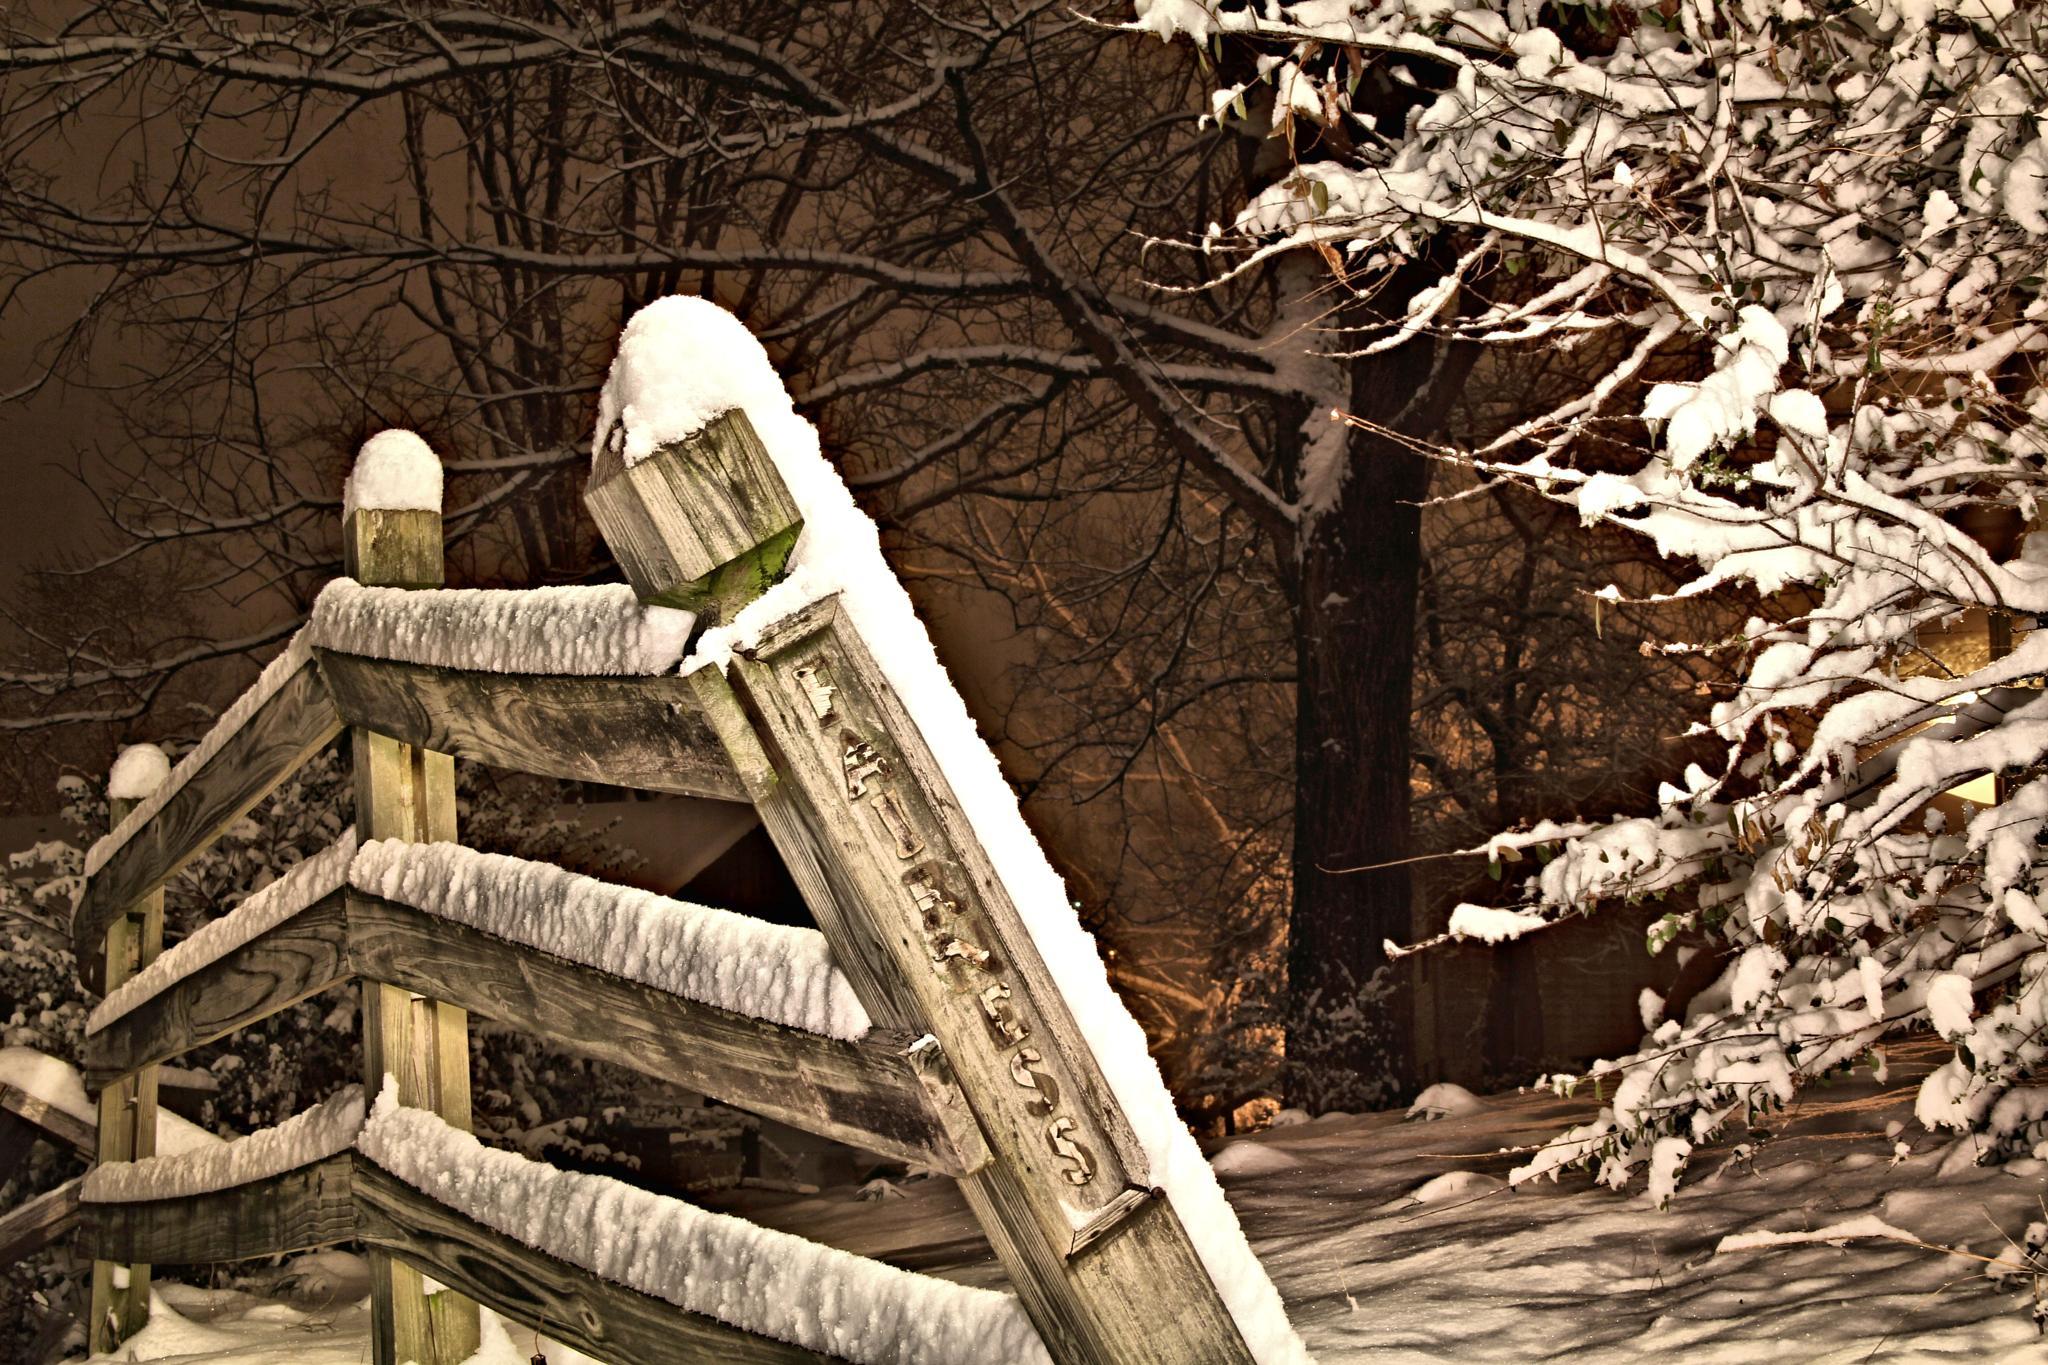 Snowy Fence by daryl.chamlee.9